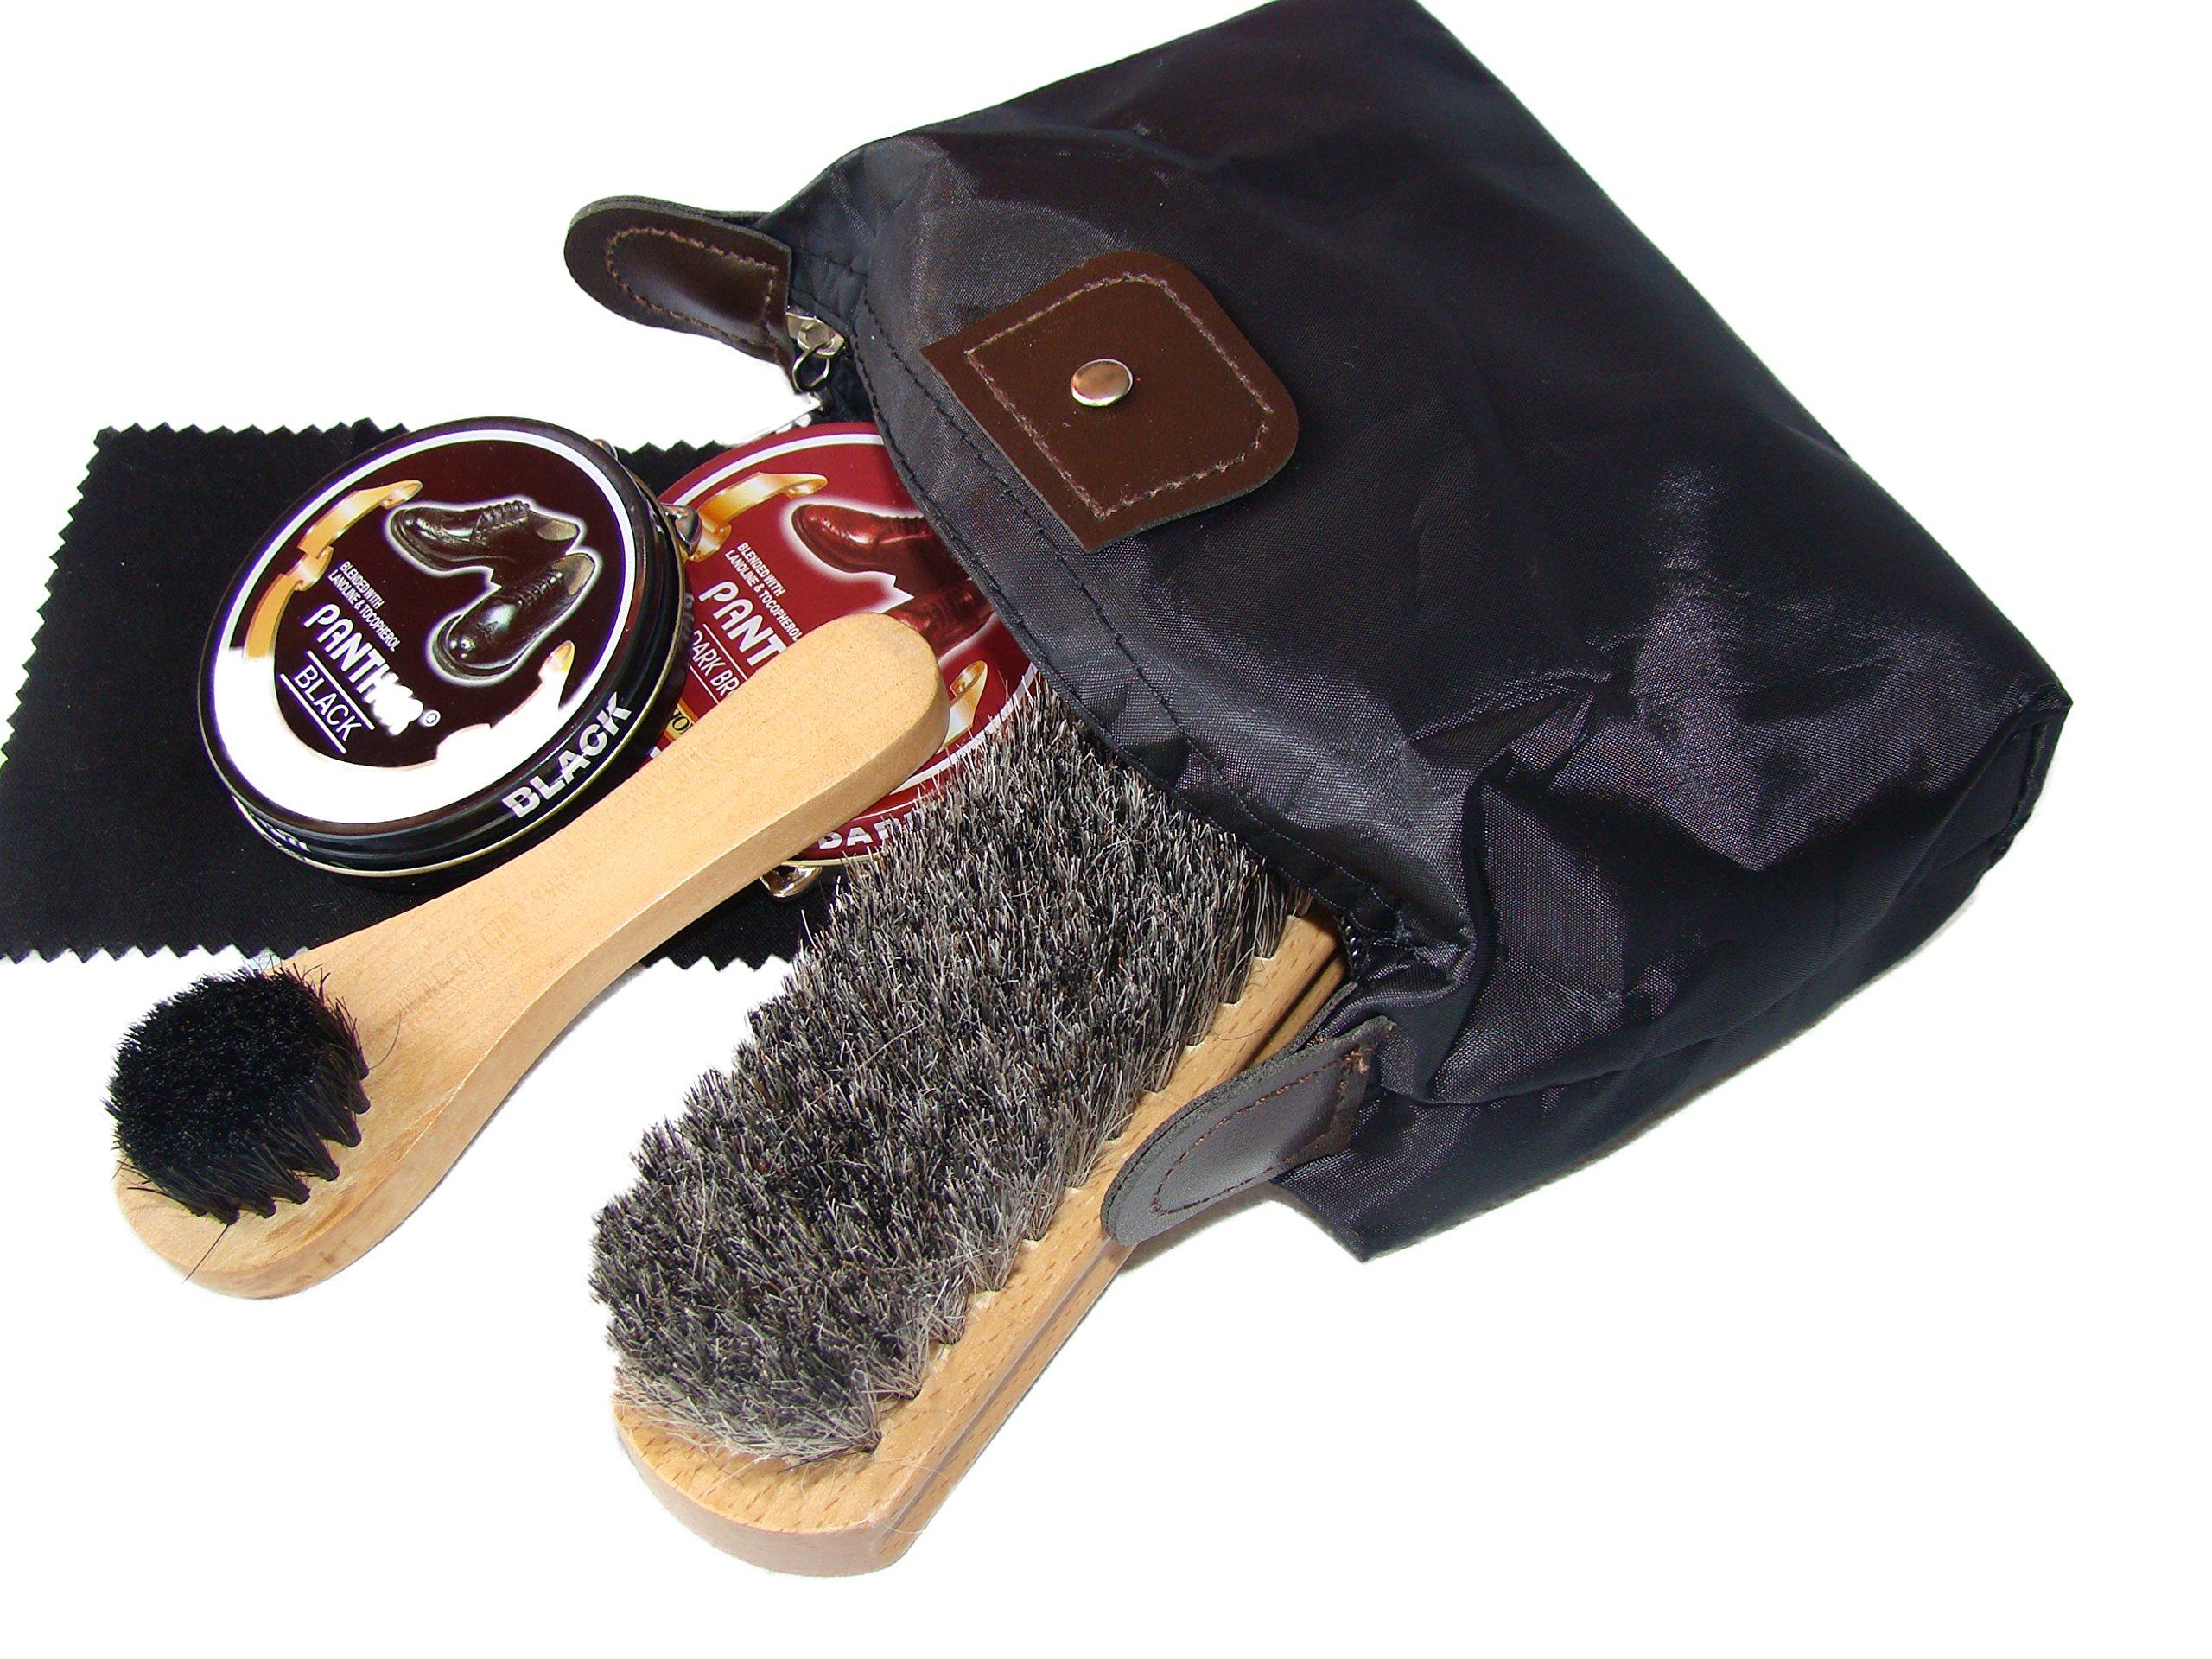 Shoe Shine Kit with Professional Horse Hair Buffing Brush